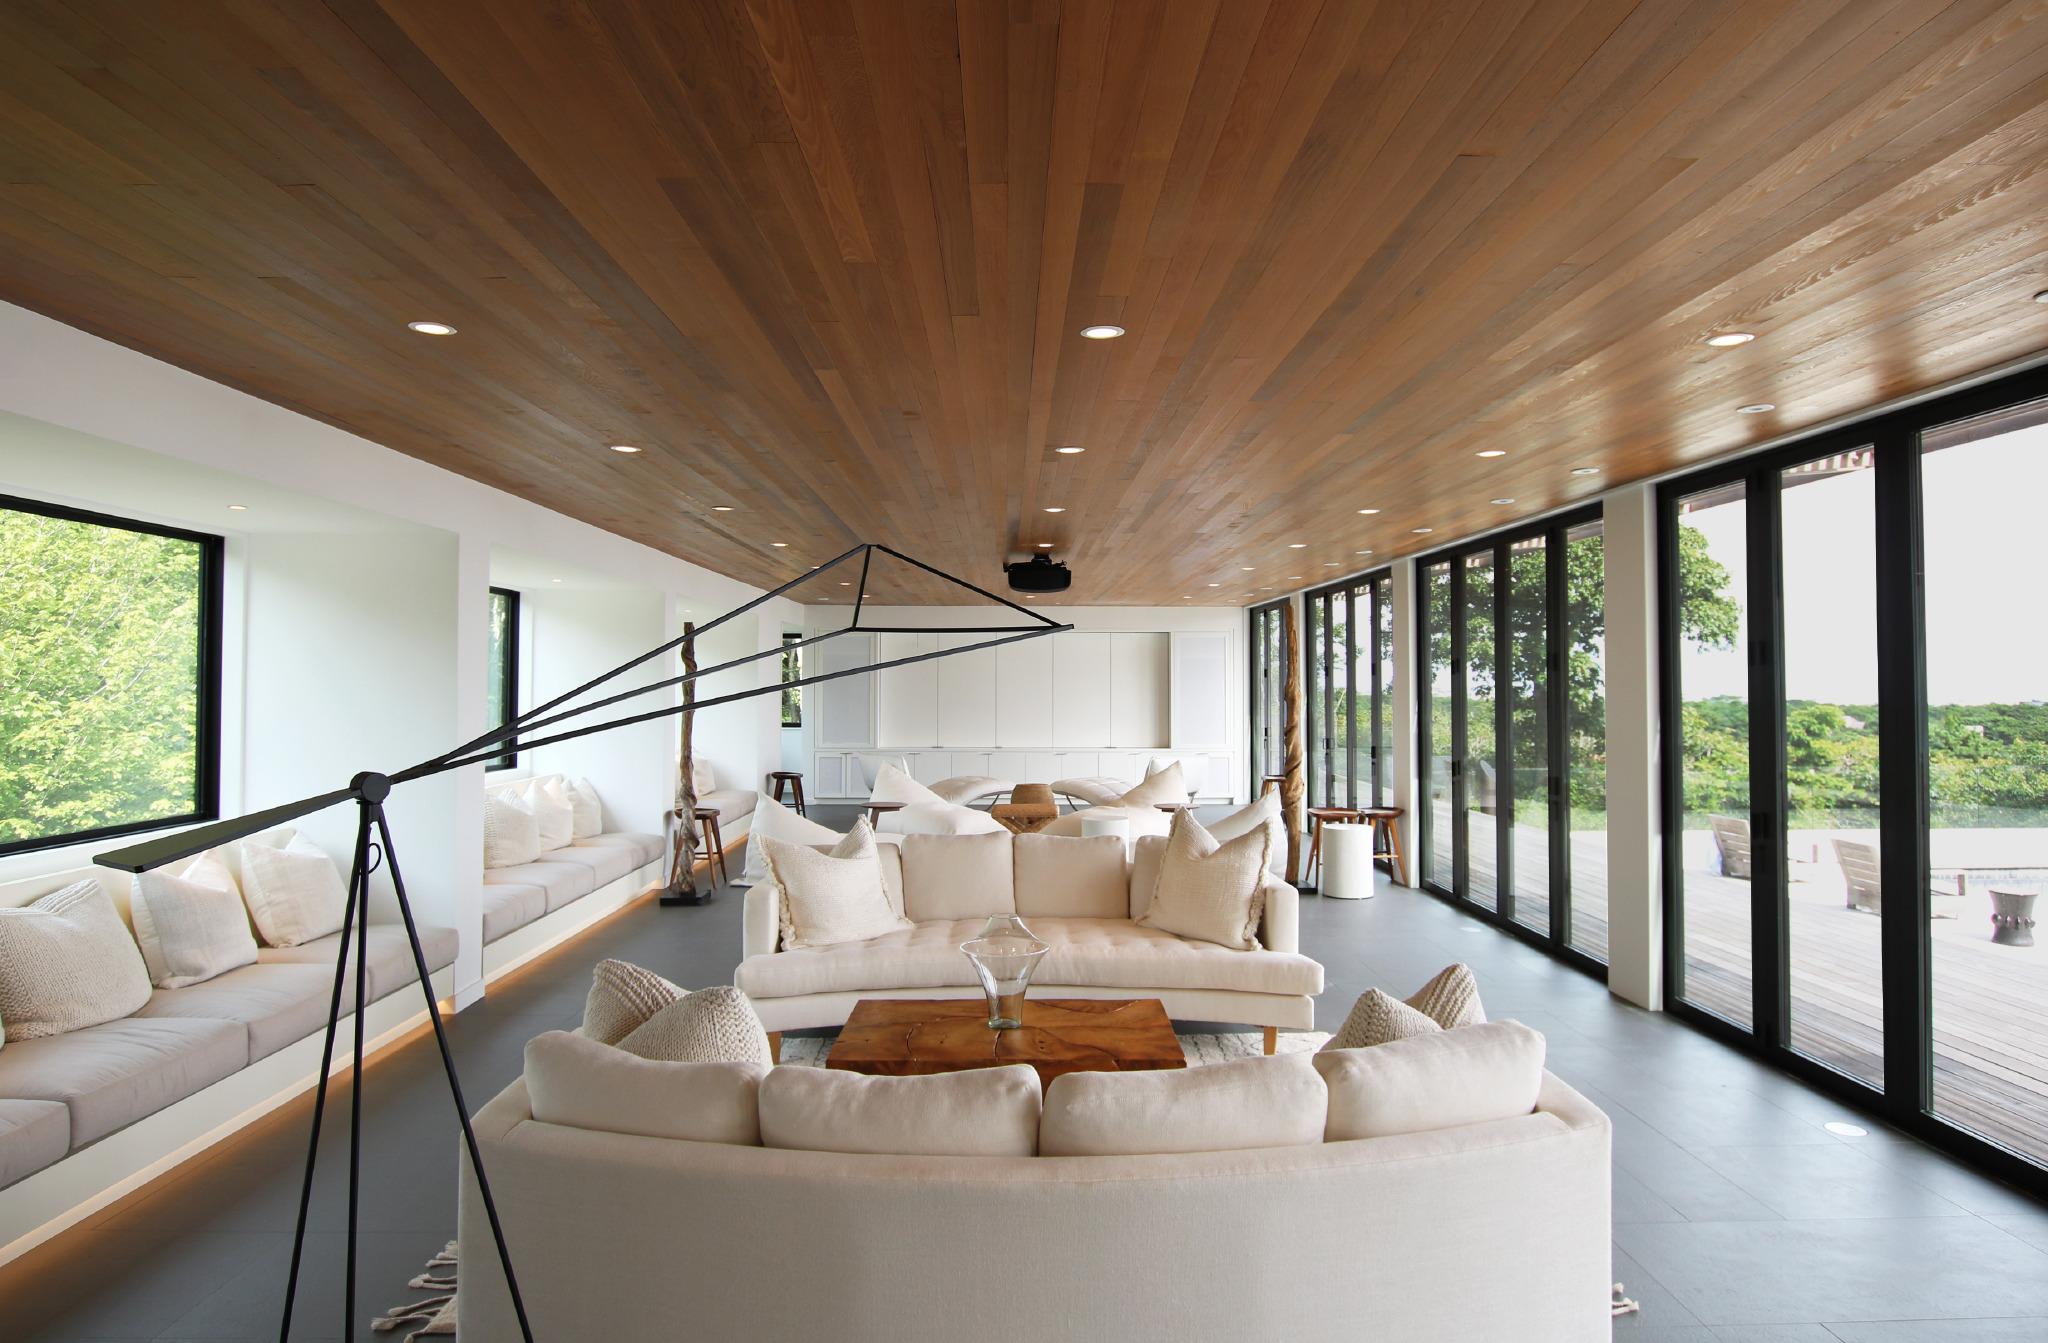 res4-resolution-4-architecture-modern-modular-house-prefab-amagansett-addition-interior-living-room-lounge.jpeg